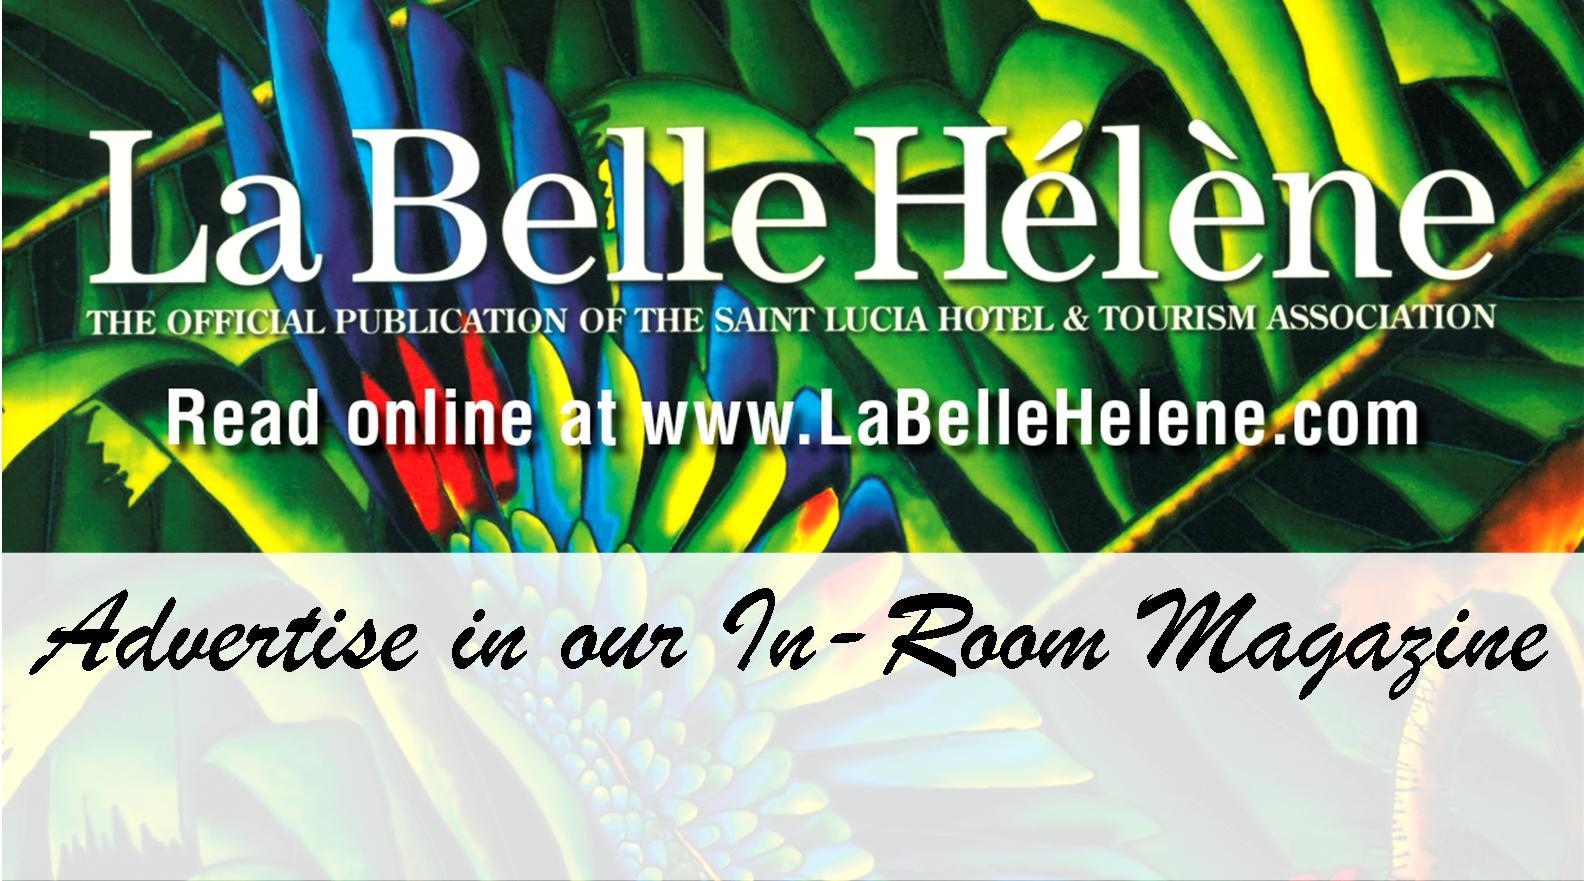 La-Belle-Helene-2016-Ad-theme-timeline